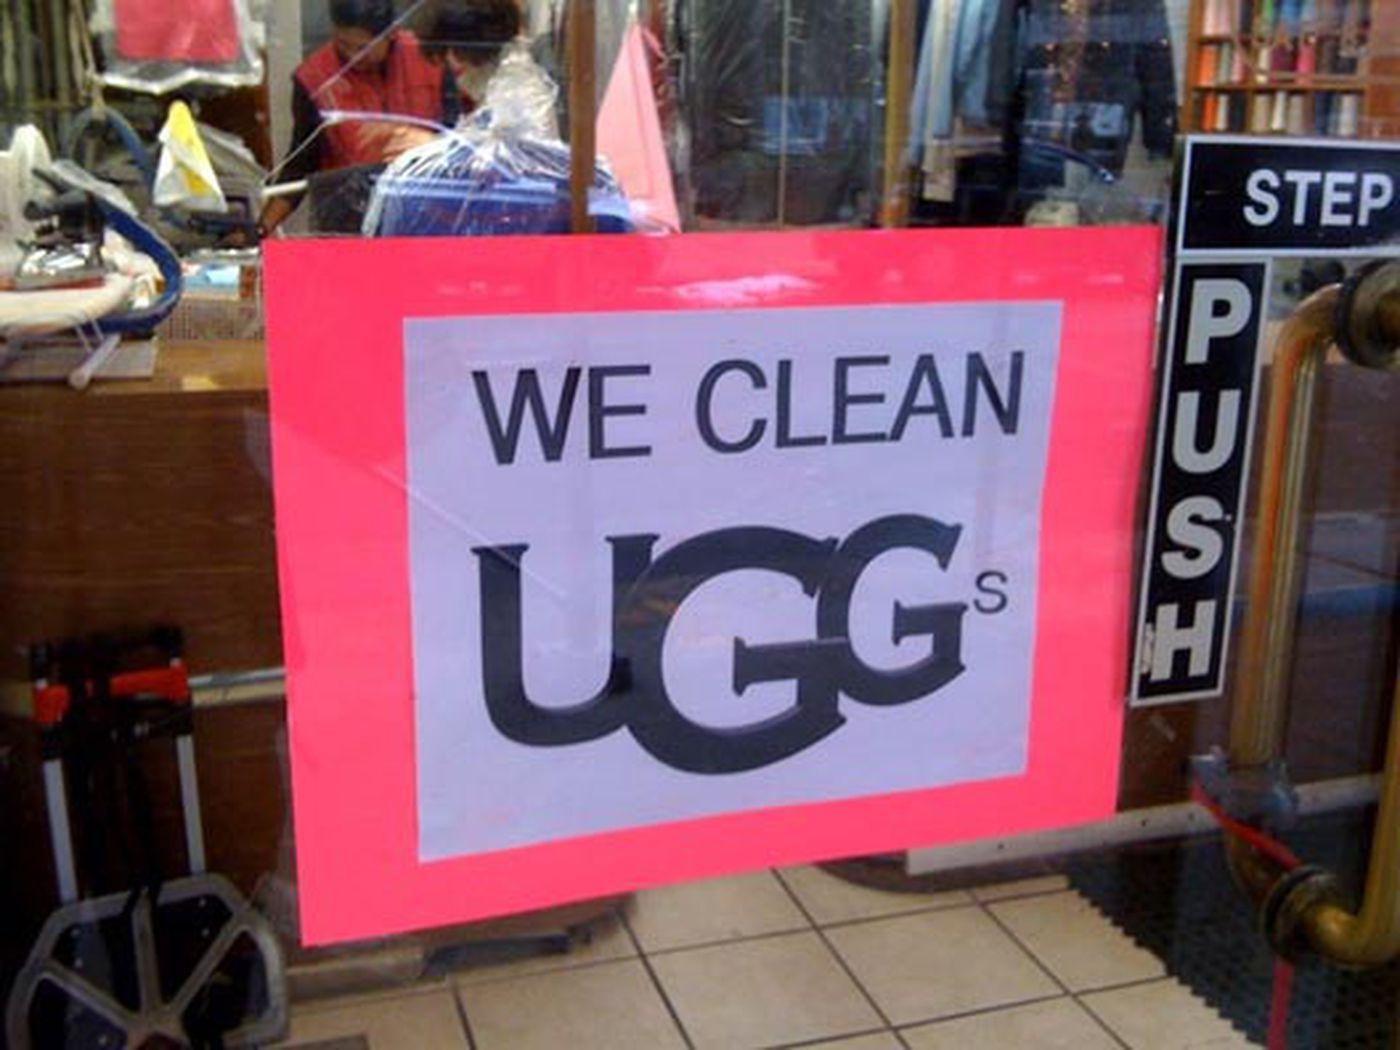 ugg store 67th street